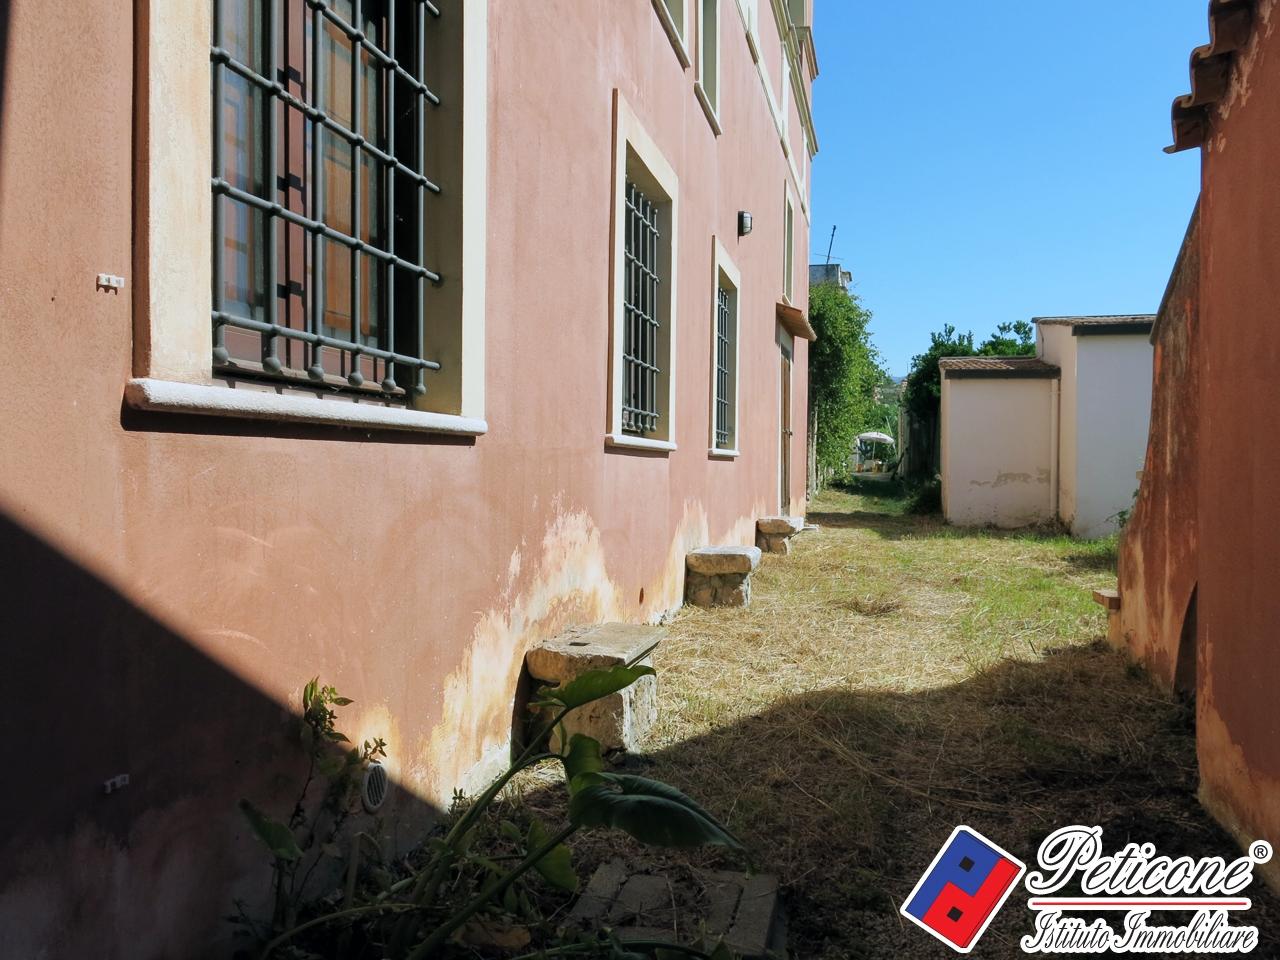 Villa in Vendita a Gaeta: 5 locali, 250 mq - Foto 21